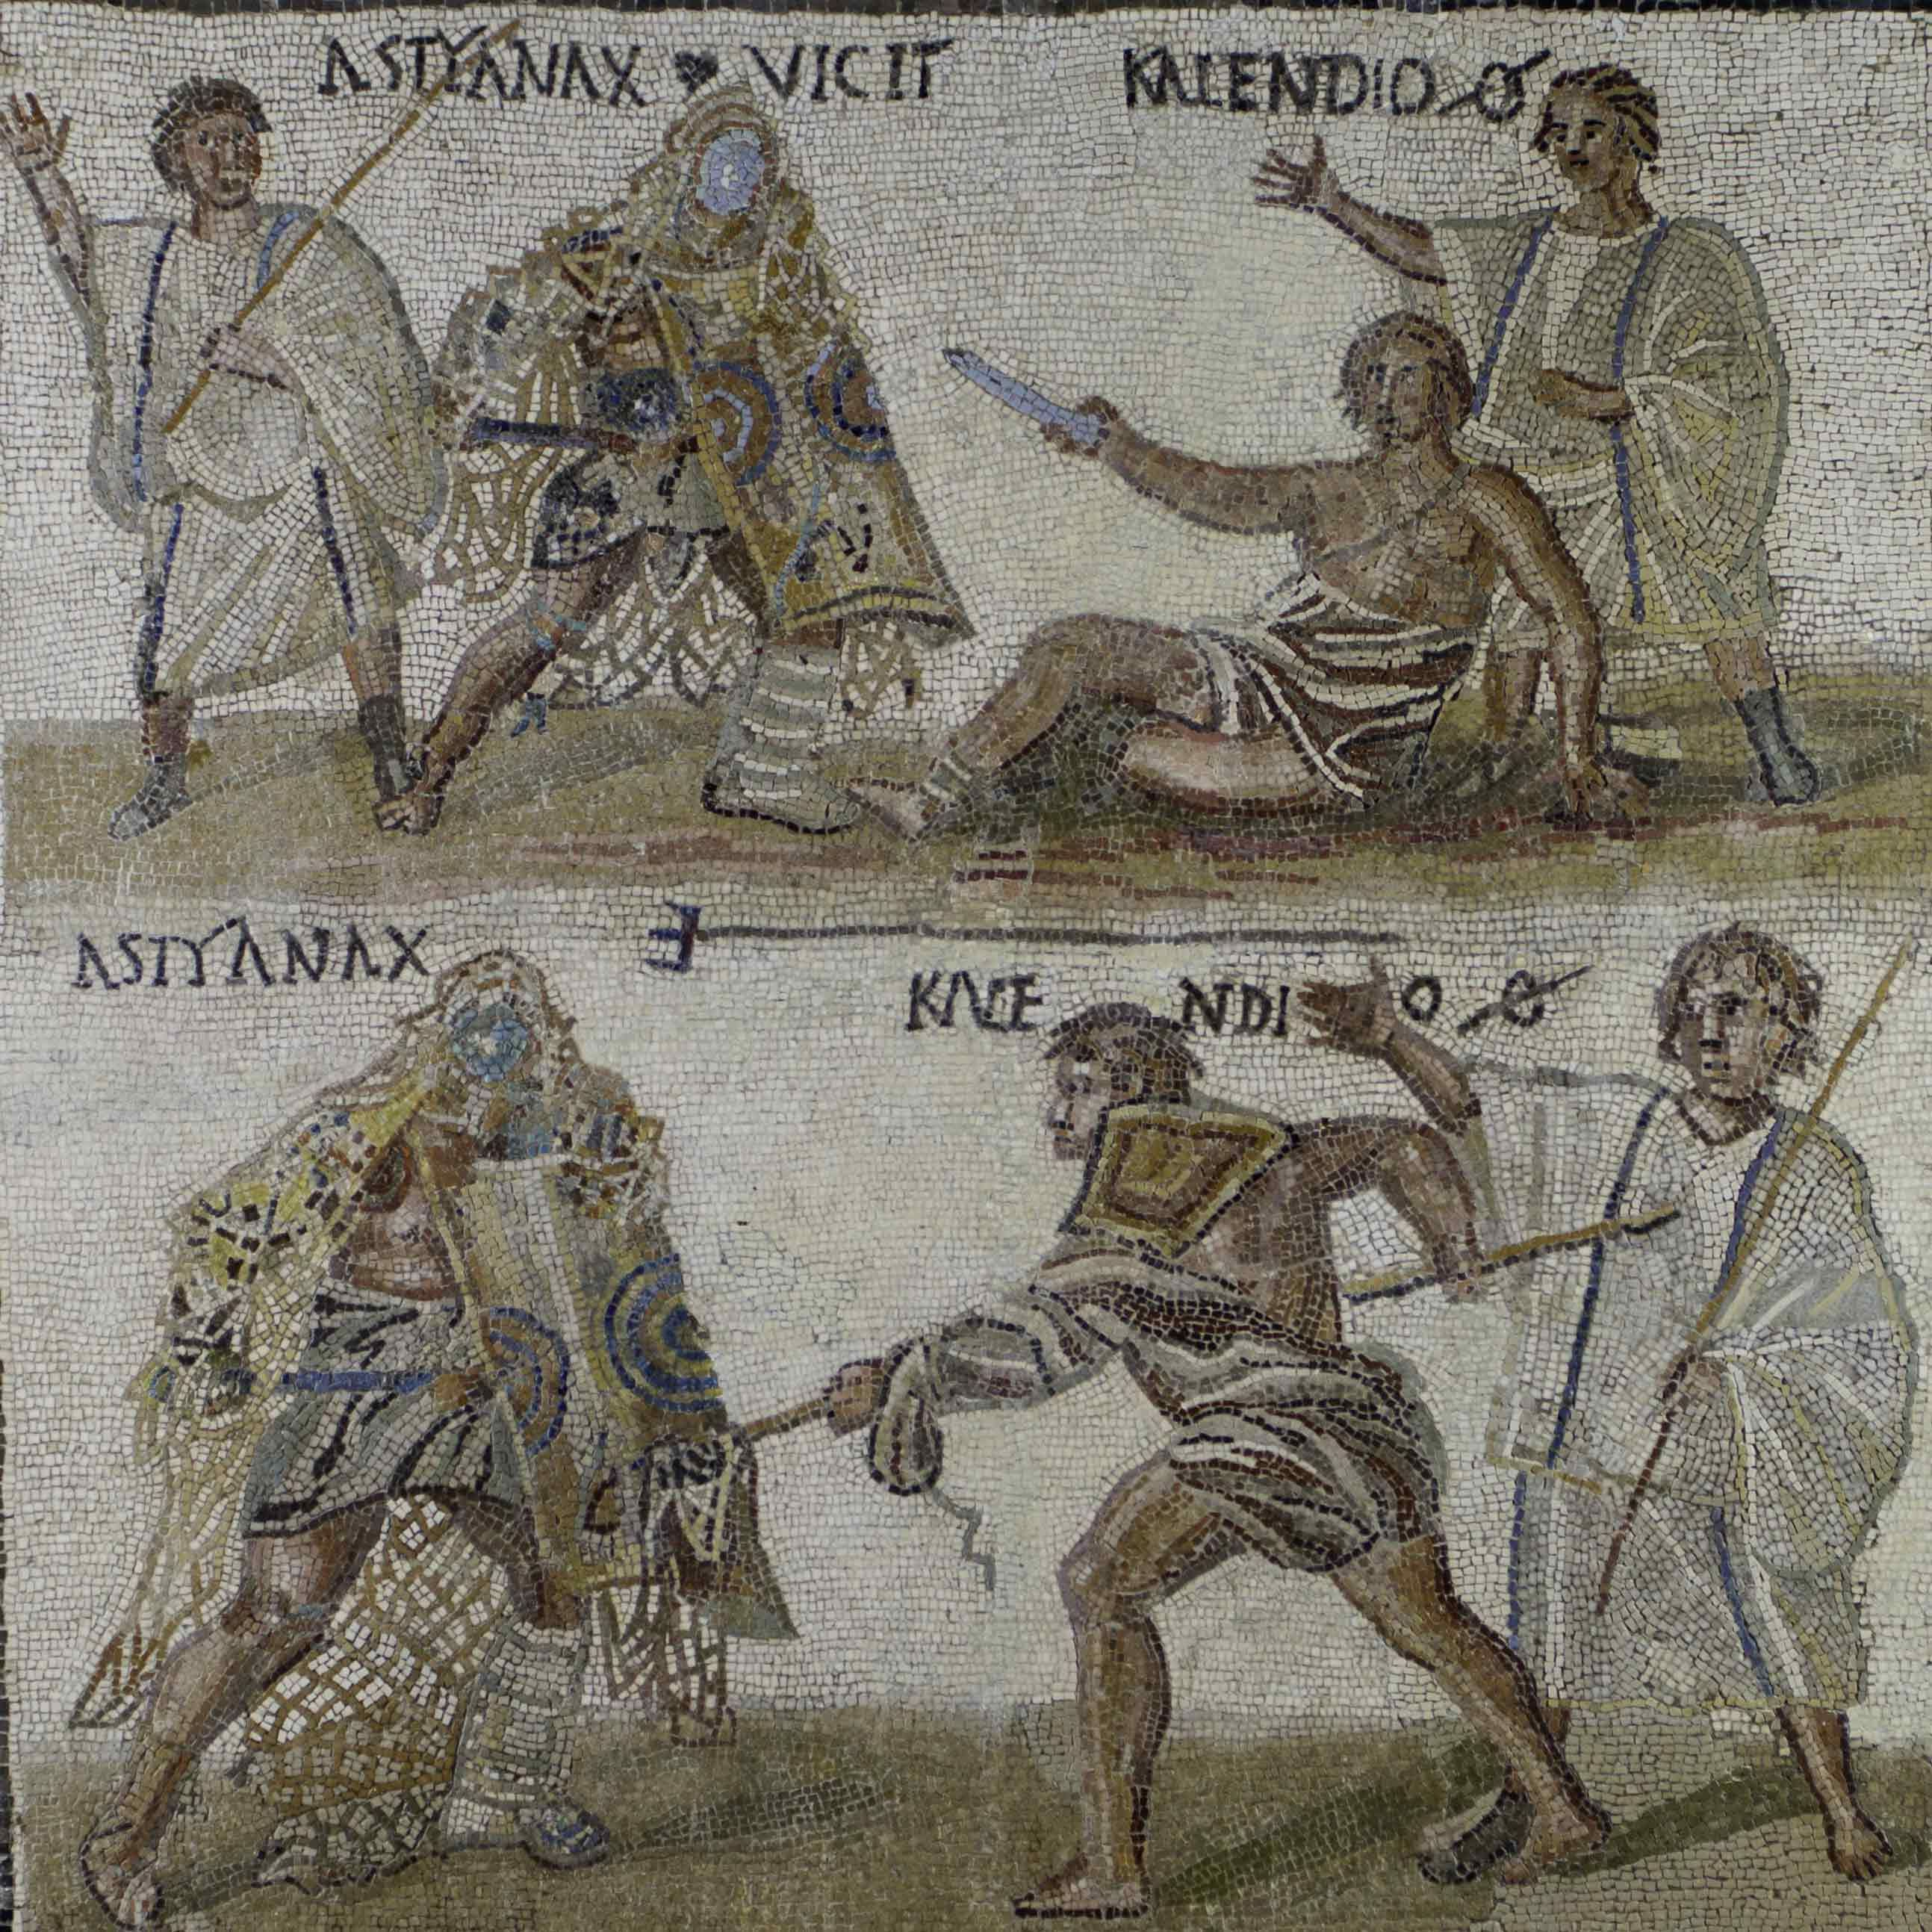 http://www.man.es/man/coleccion/catalogo-cronologico/hispania-romana.html